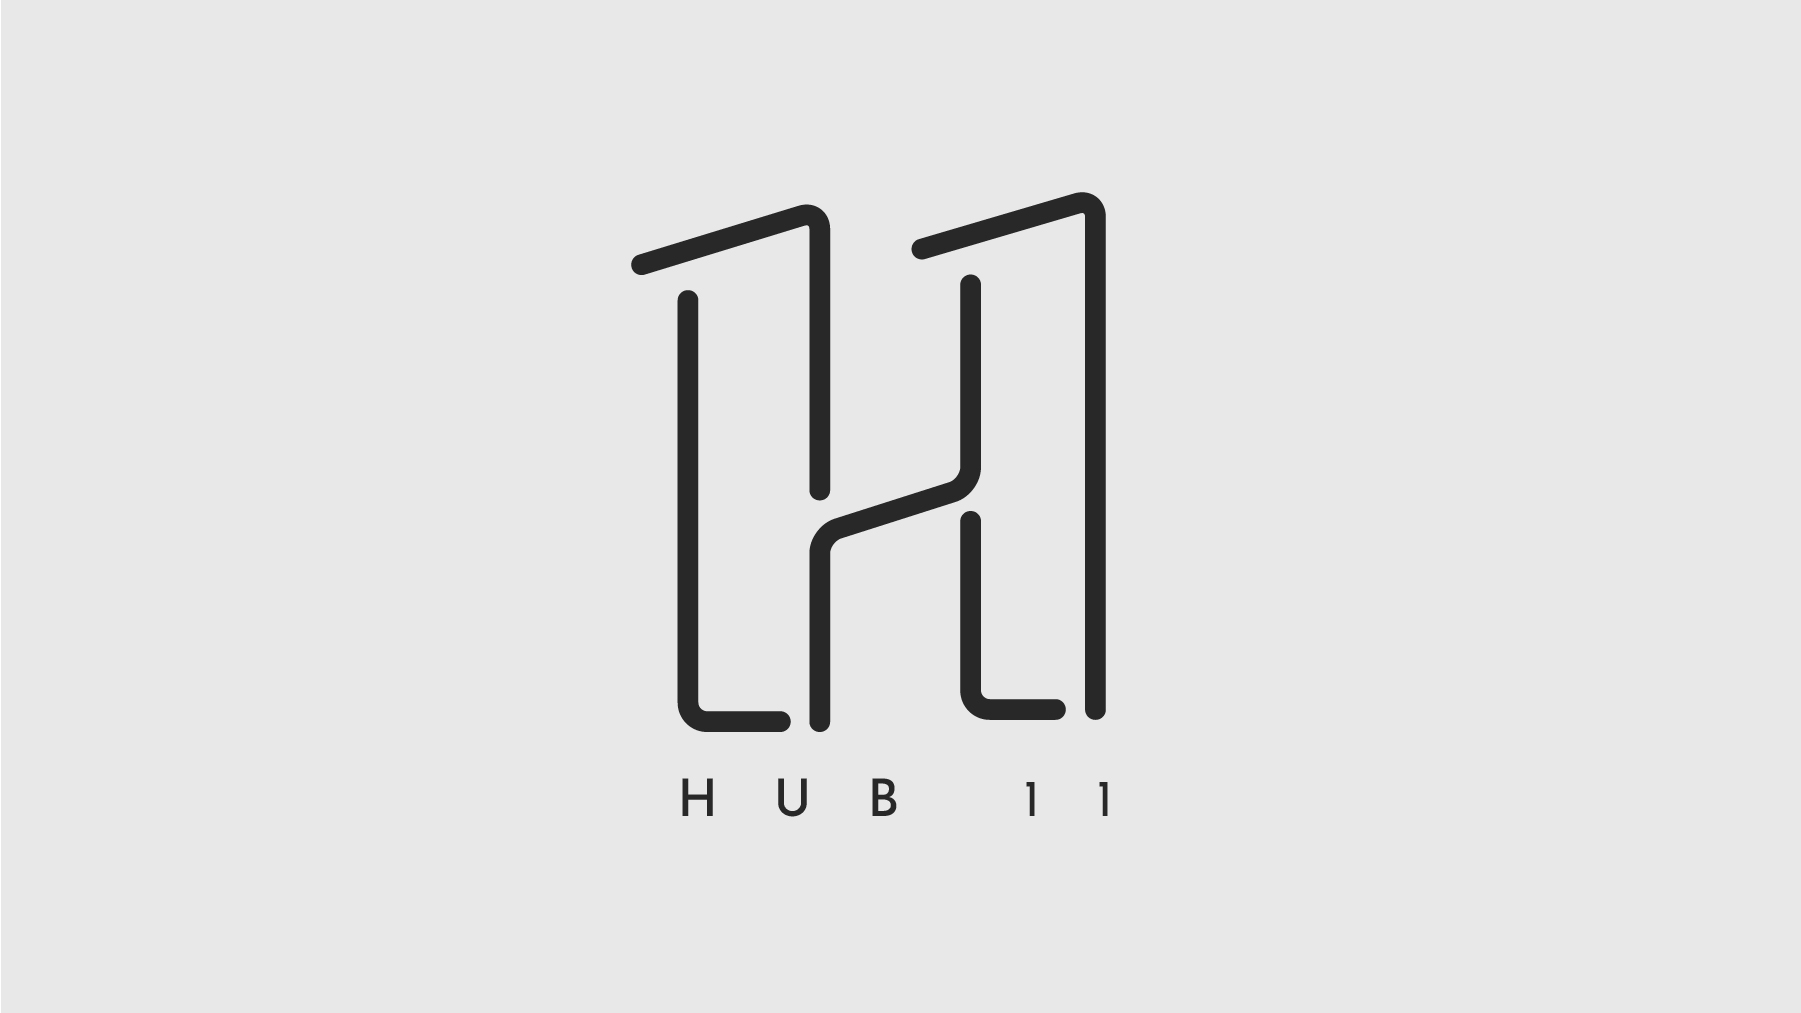 Hub11